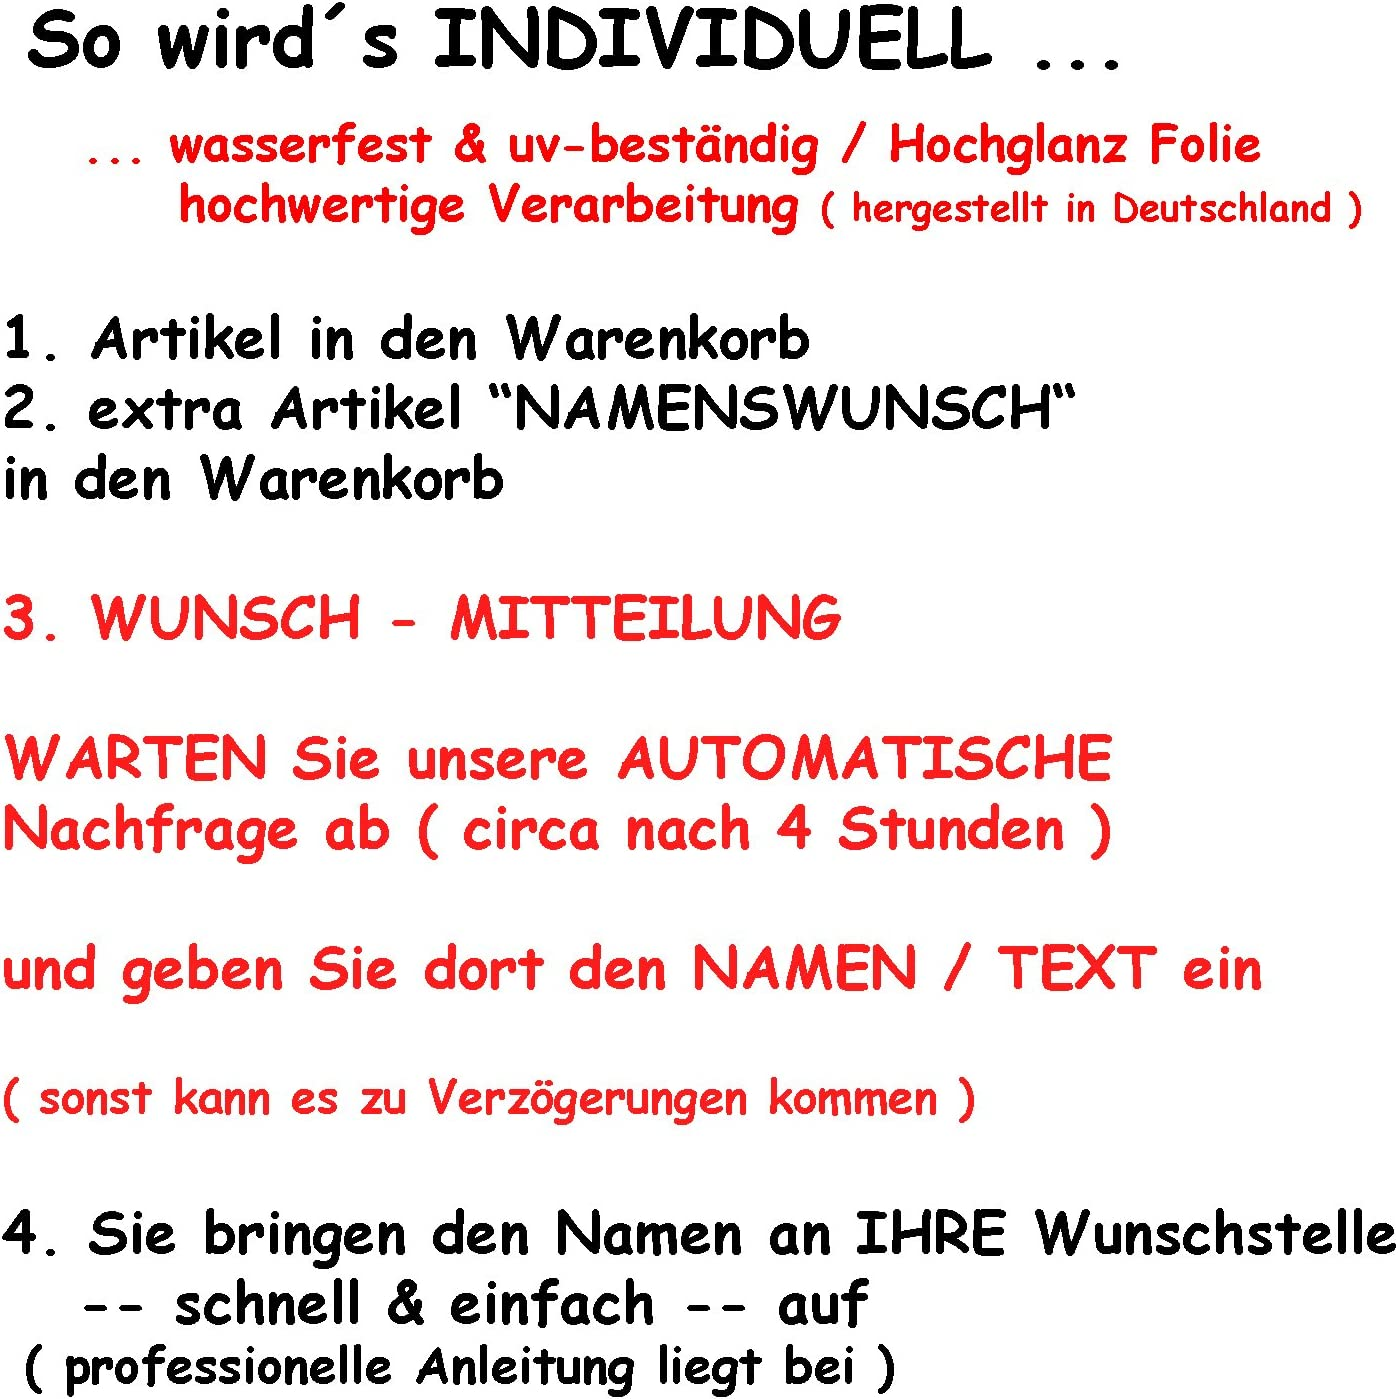 alles-meine.de GmbH Me/ßlatte Holz Messlatte Kinderzimmer Holzme/ßlatte f/ür Kinder Kind Ritterburg Holzme/ßlatte Drachen Falten Ritter und Drache zum Klappen